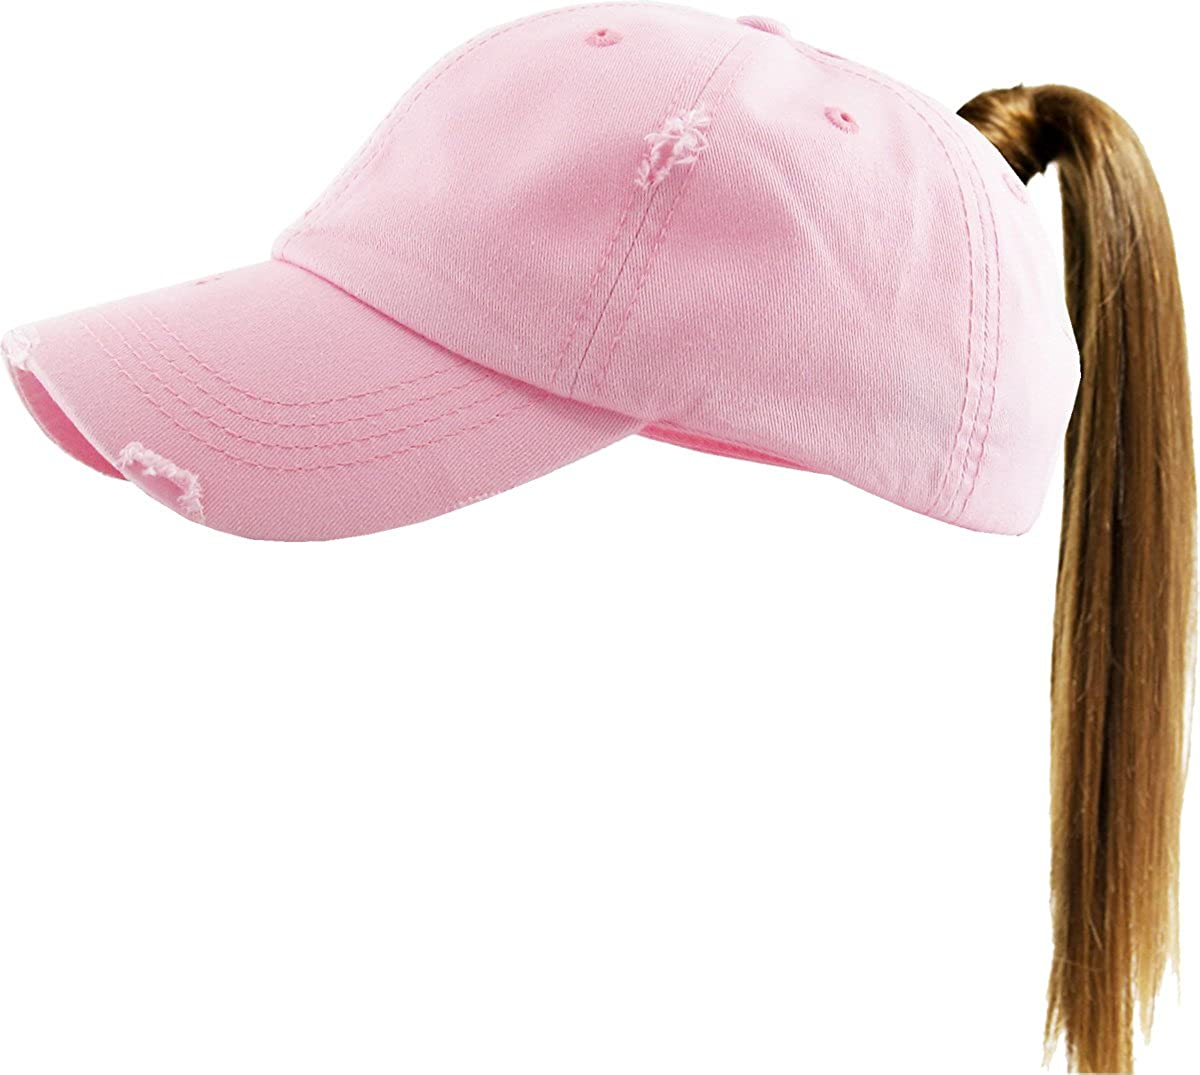 KBETHOS Ponytail Messy High Bun Adjustable Cotton and Mesh Trucker Baseball Cap B075QLR6H8 PONY-001 BLK